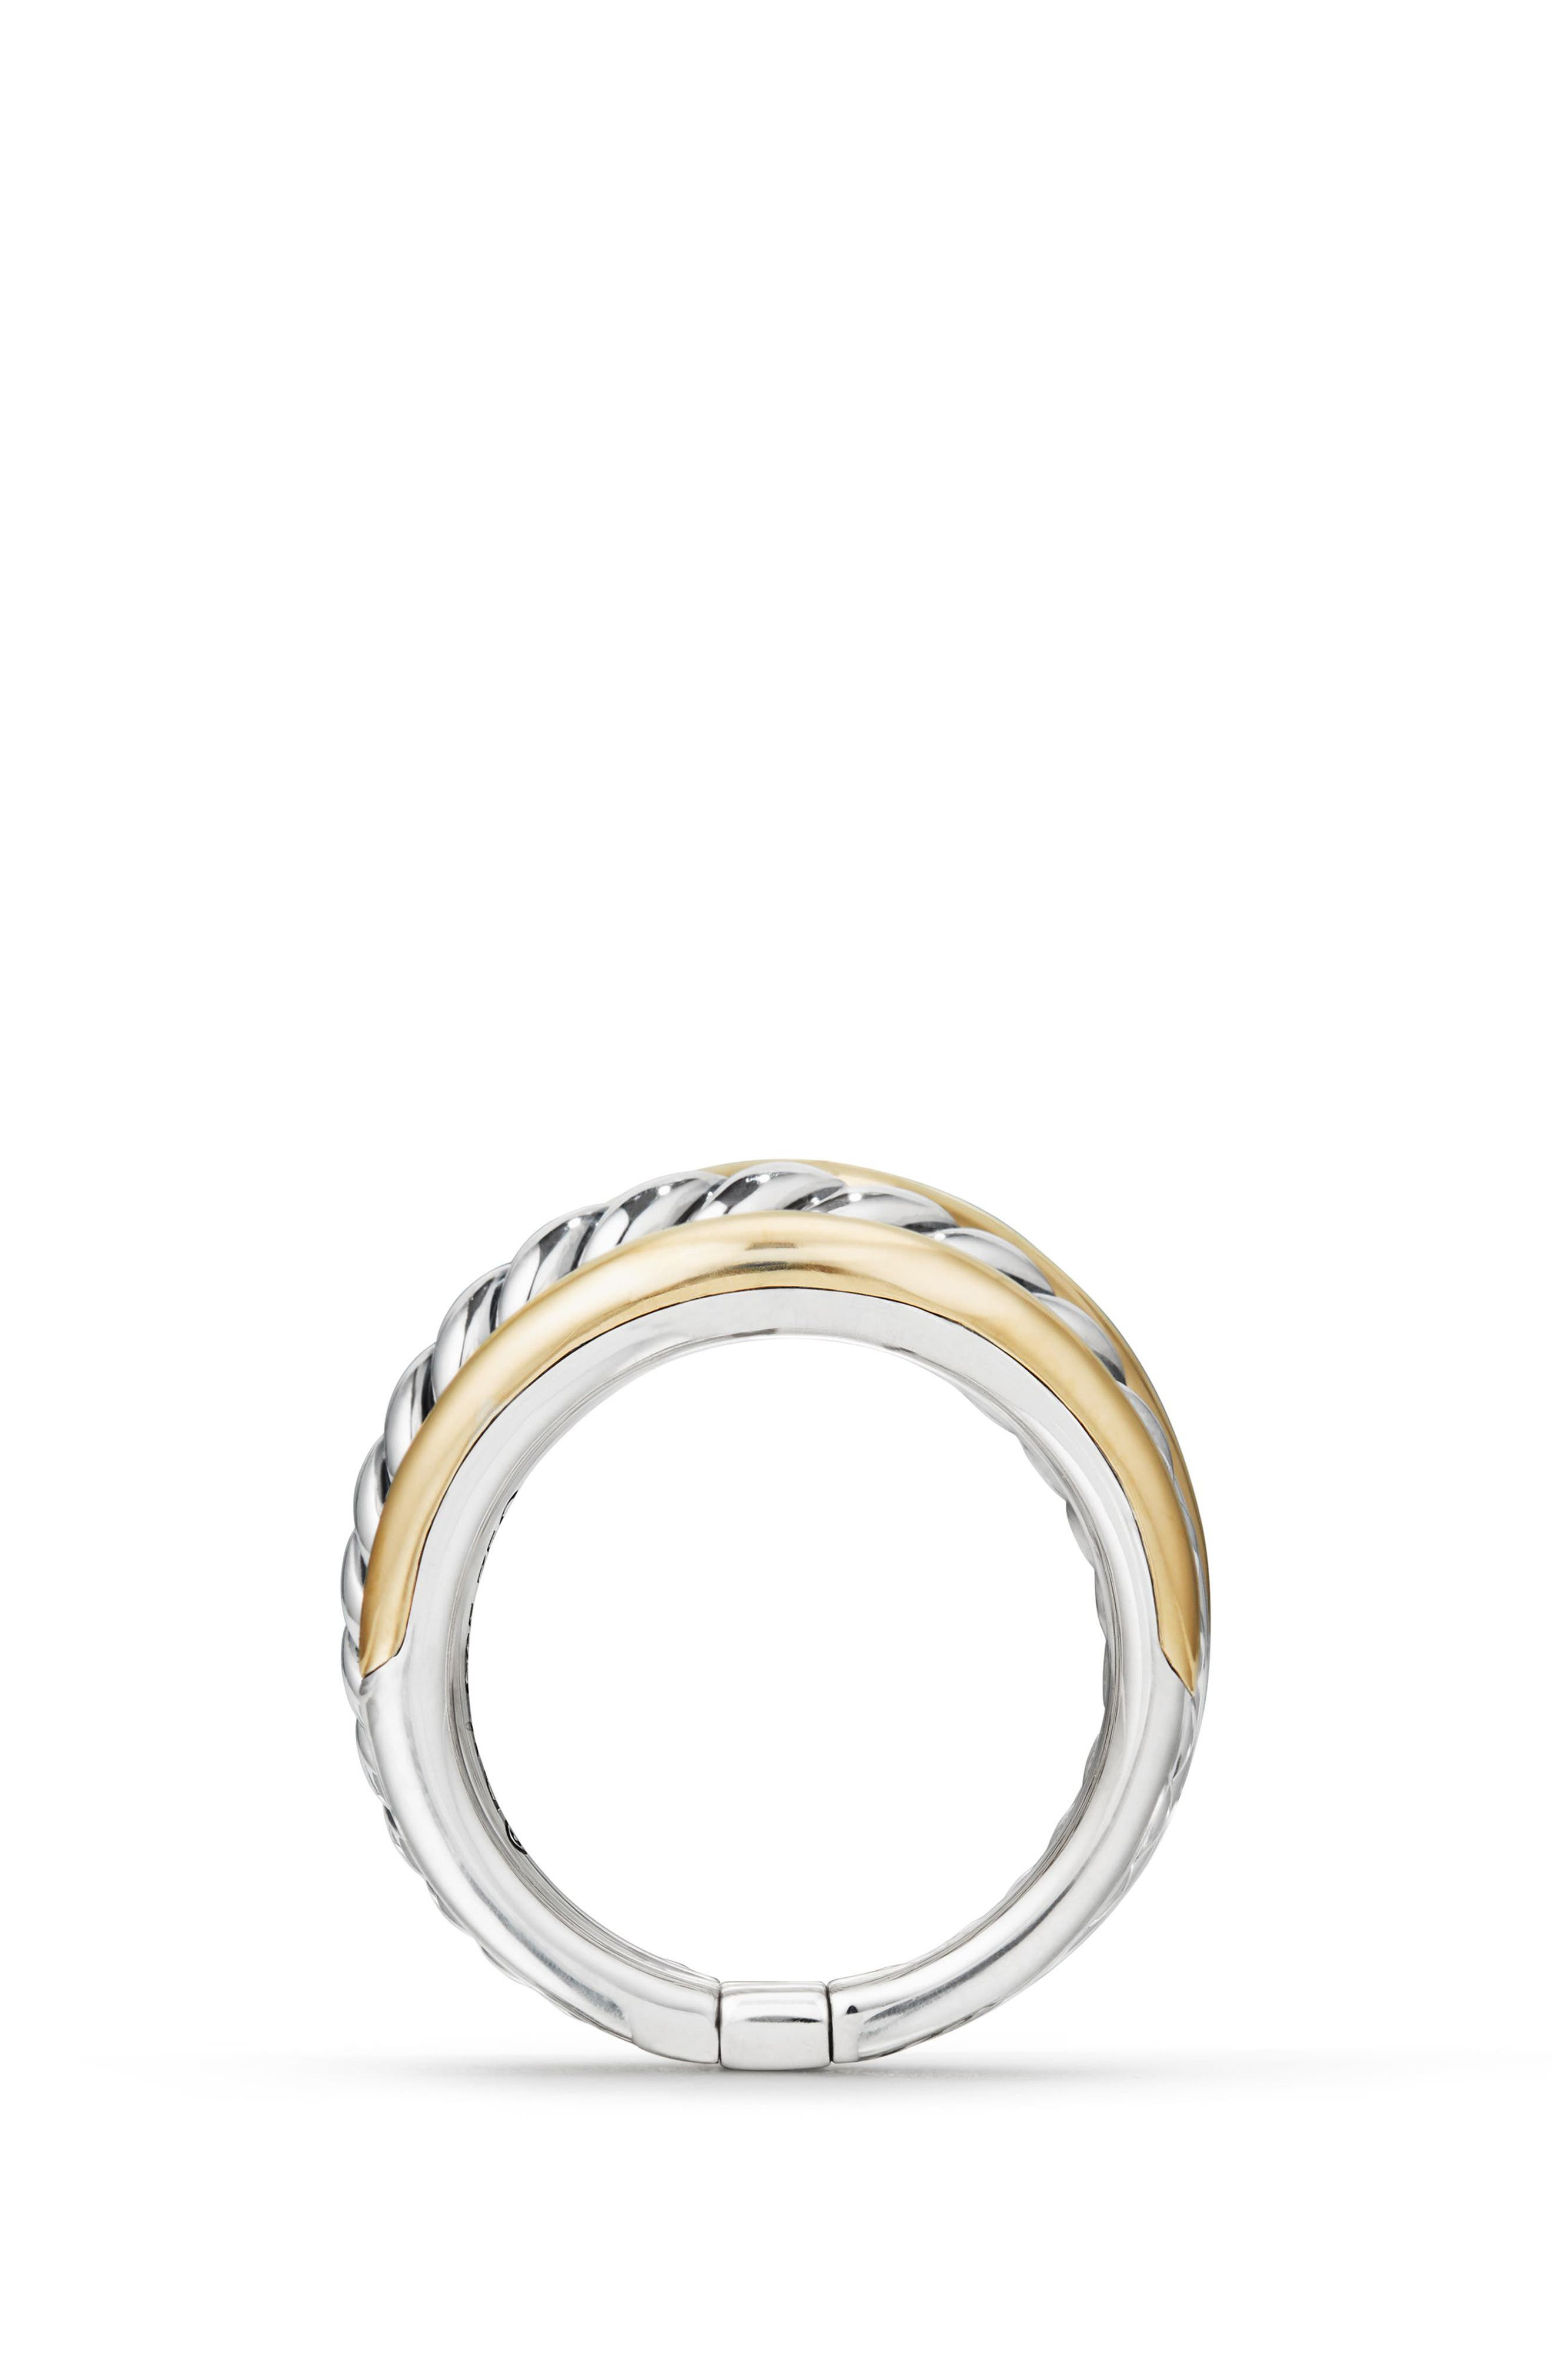 DAVID YURMAN,                             Pure Form<sup>®</sup> Wide Ring,                             Alternate thumbnail 3, color,                             SILVER